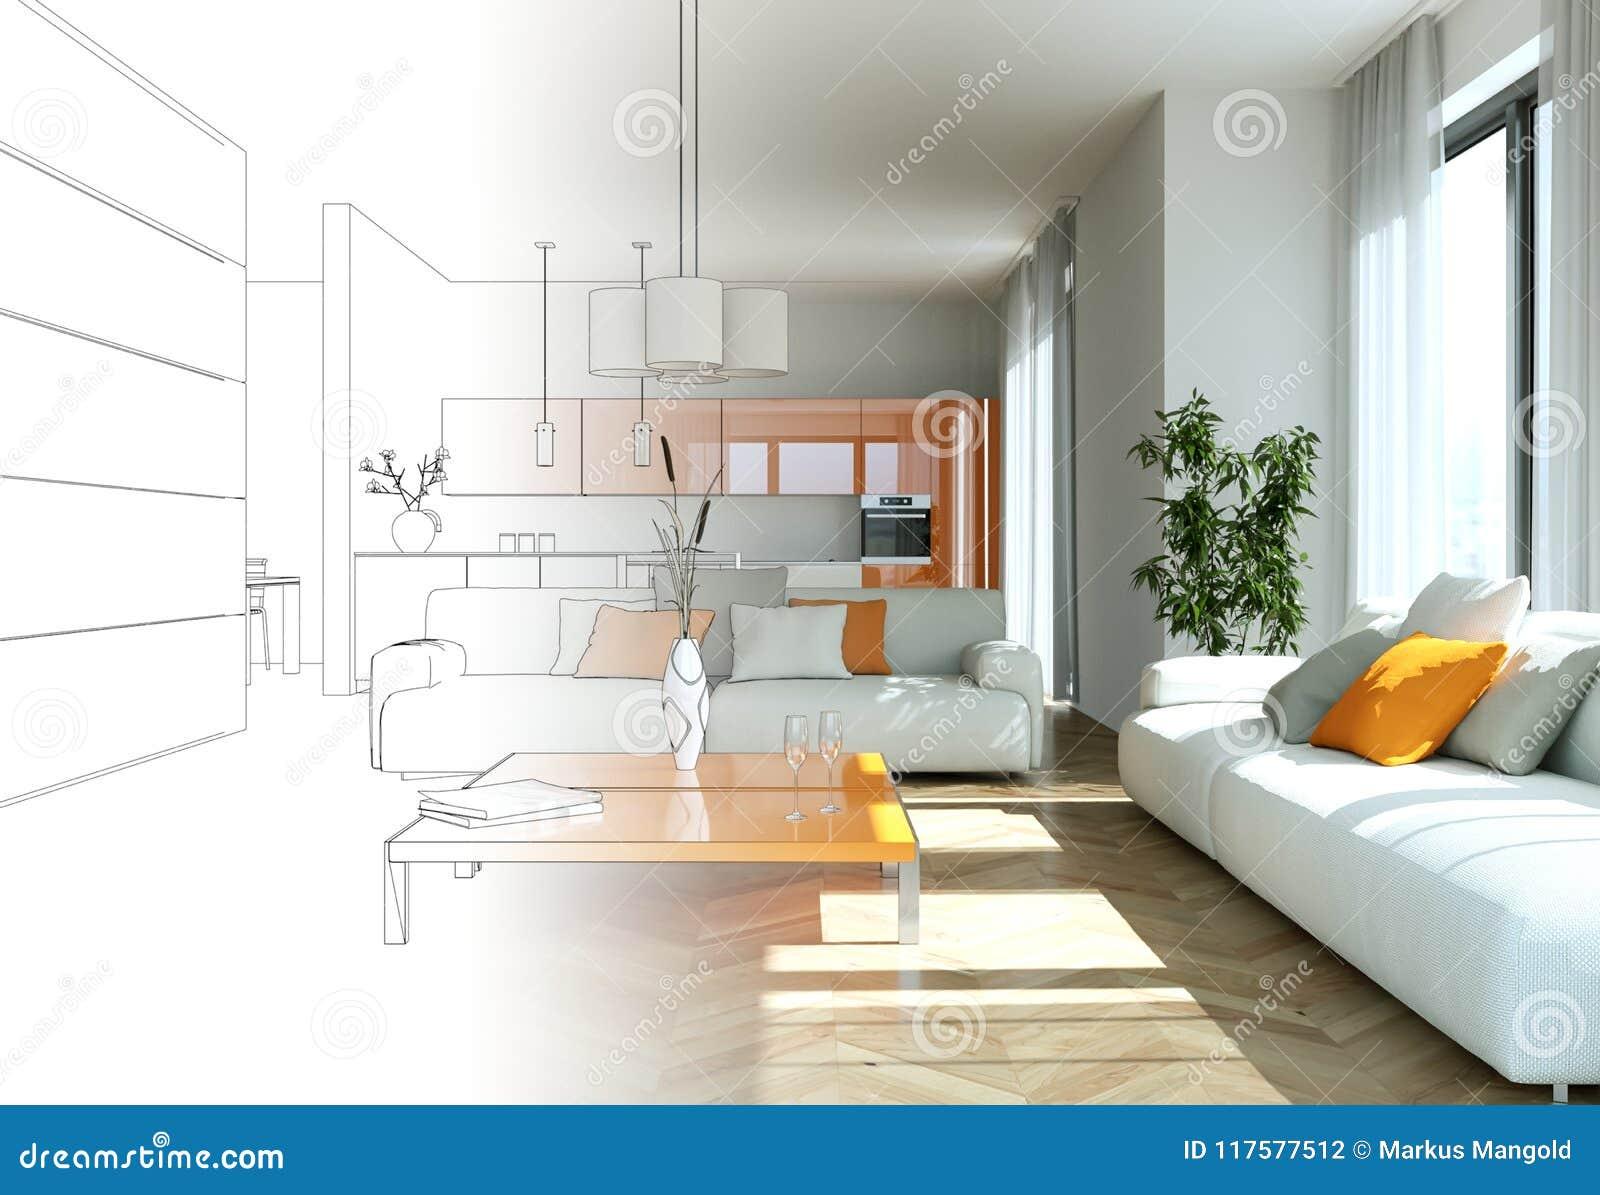 Interior Design Living Room Drawing Gradation Into Photograph Stock